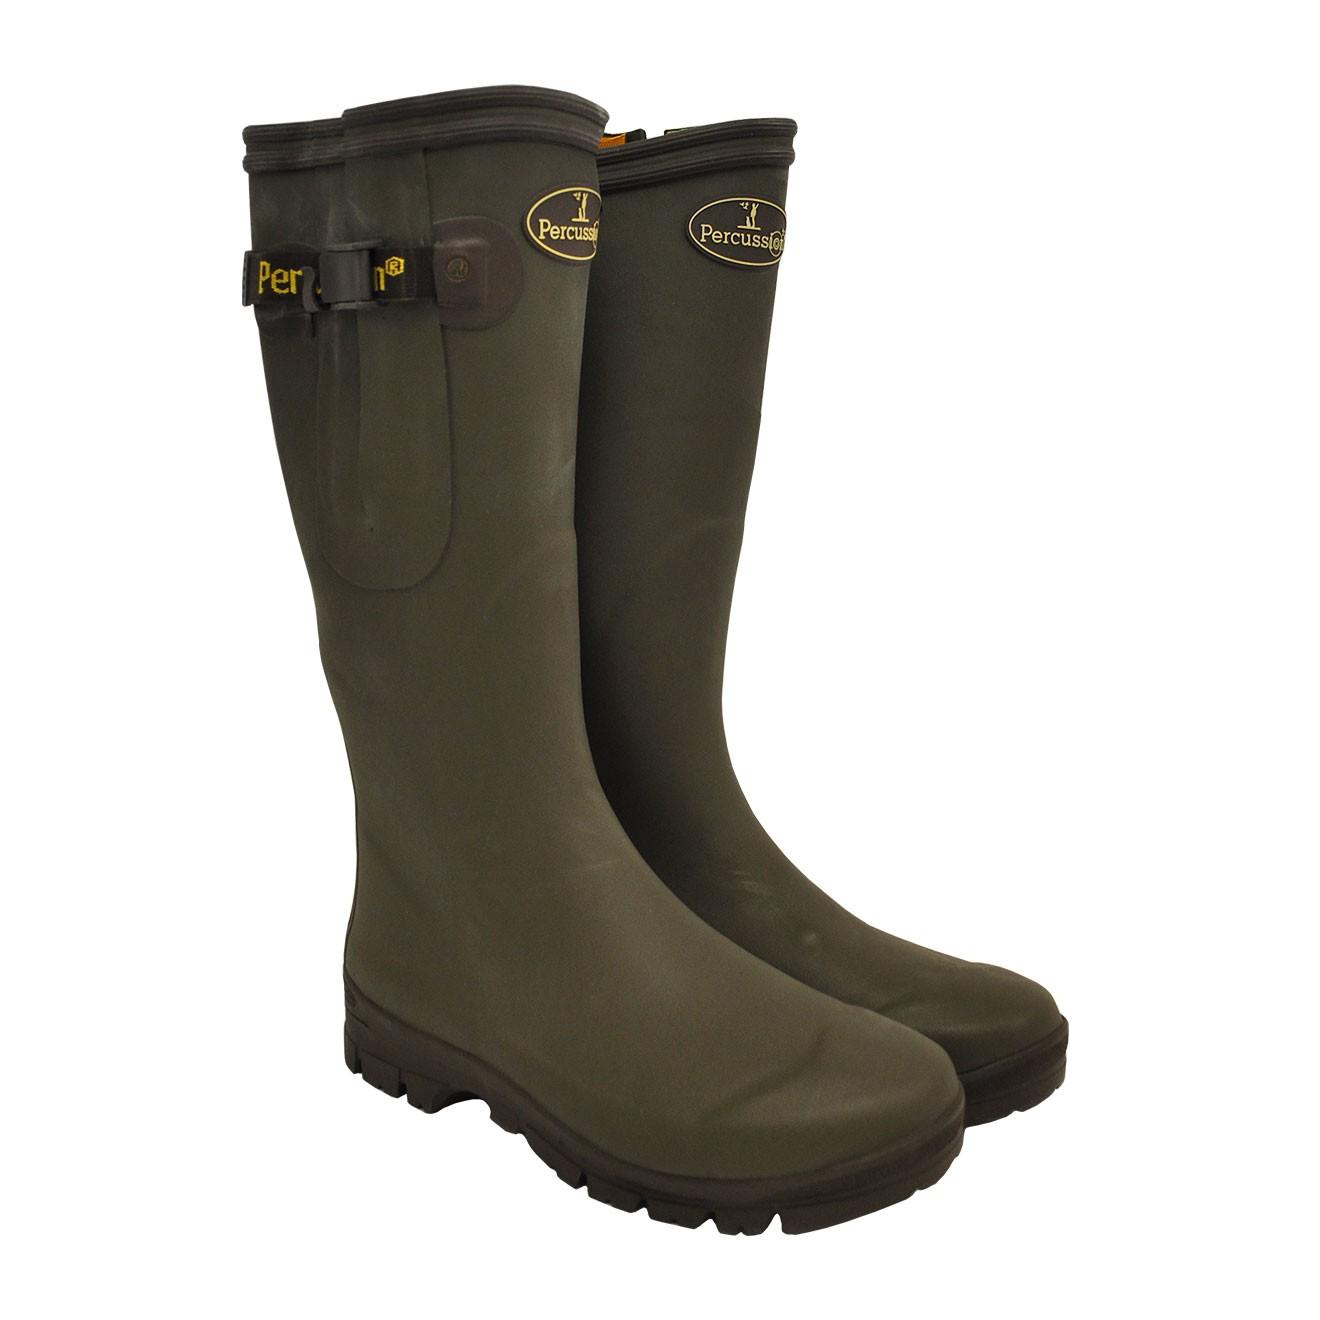 ee99d96b3915 Percussion Neoprene Hunting Wellington Boots -